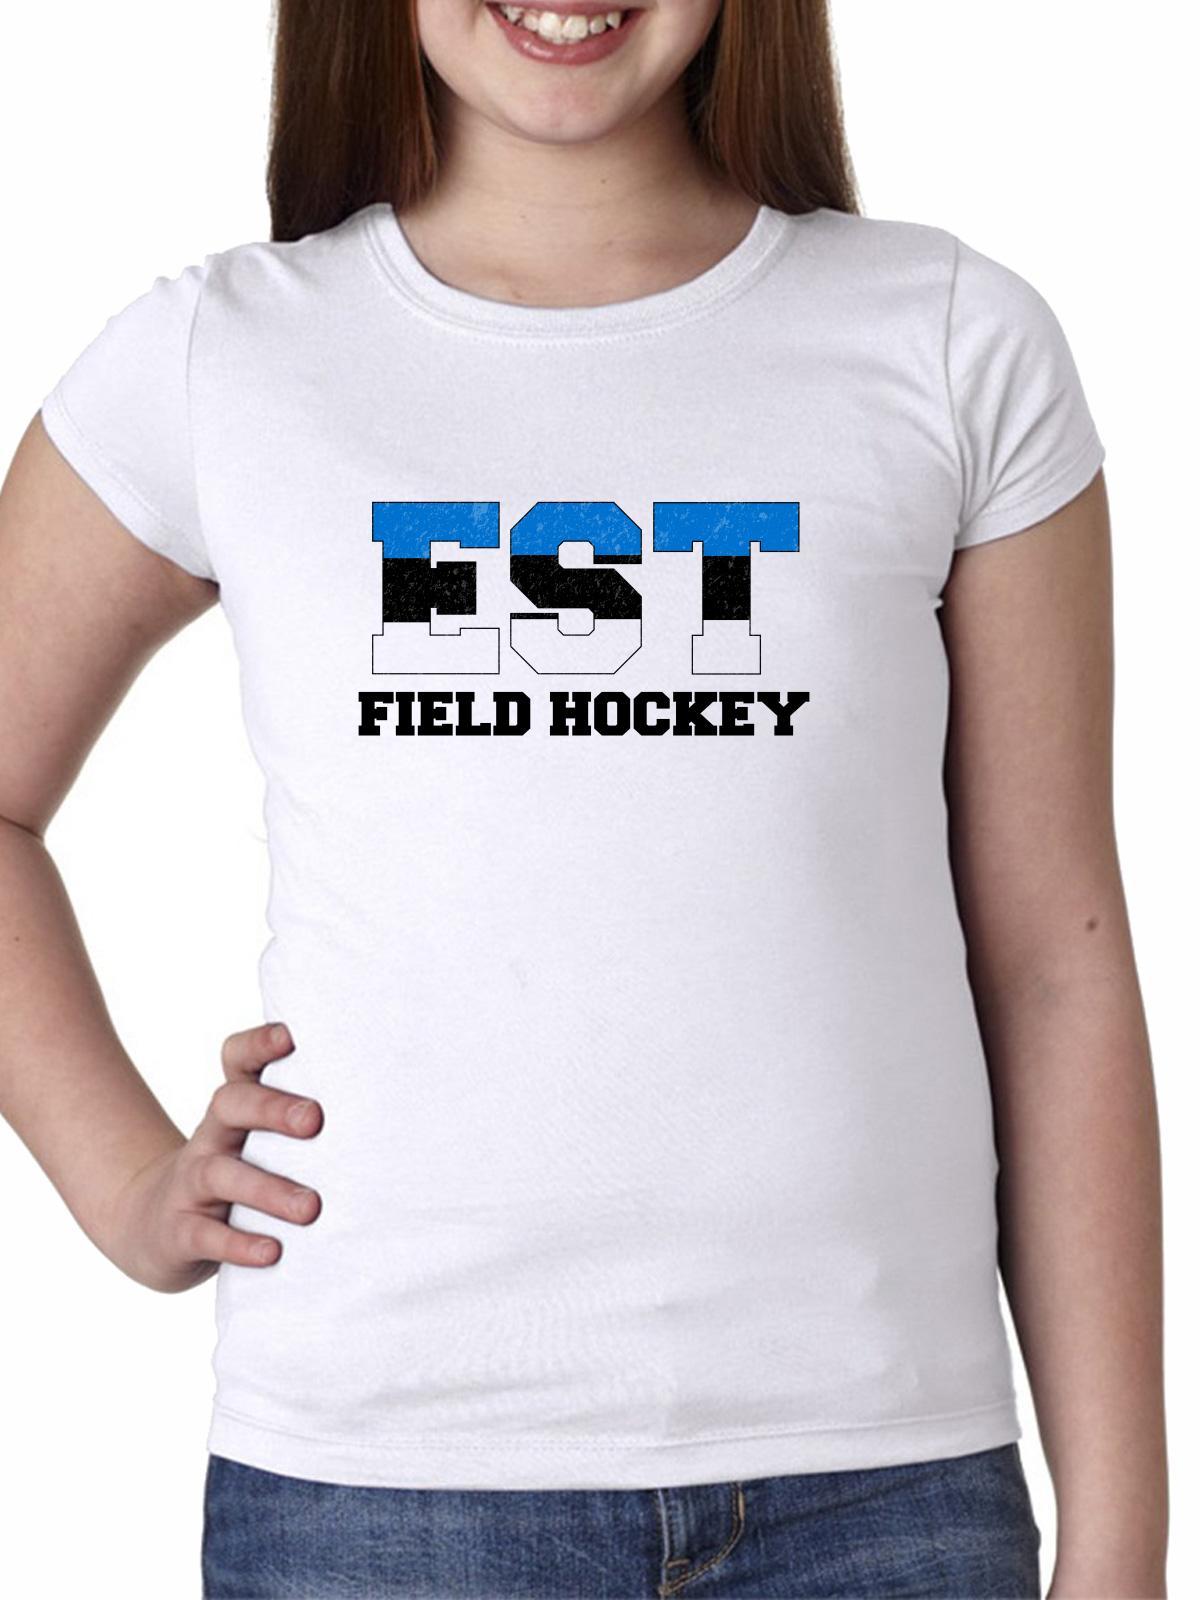 Estonia Field Hockey Olympic Games Rio Flag Girl's Cotton Youth T-Shirt by Hollywood Thread